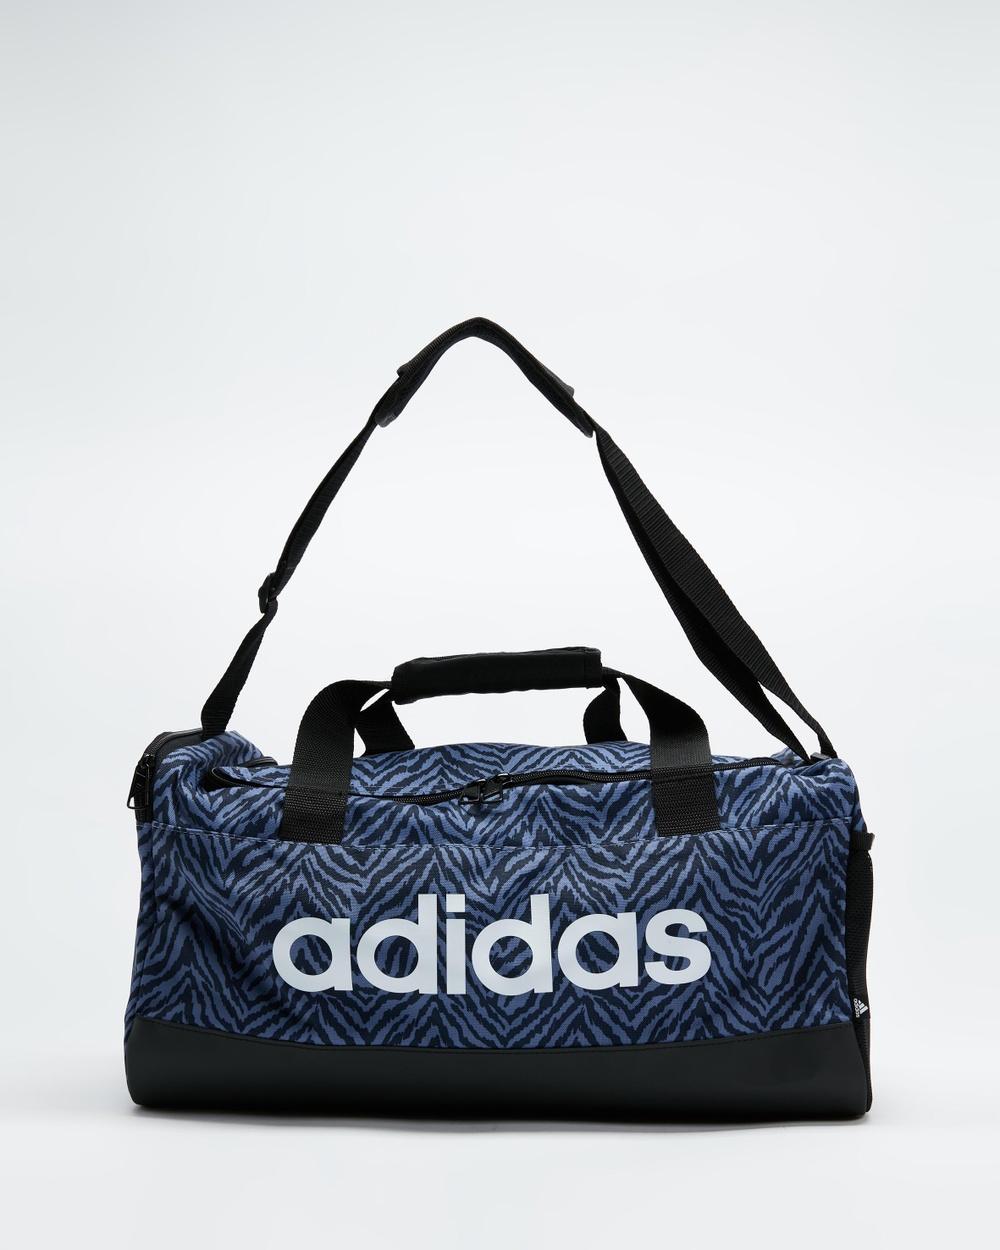 adidas Performance Zebra Duffle Bags Orbit Violet, Legend Ink & Black Botto